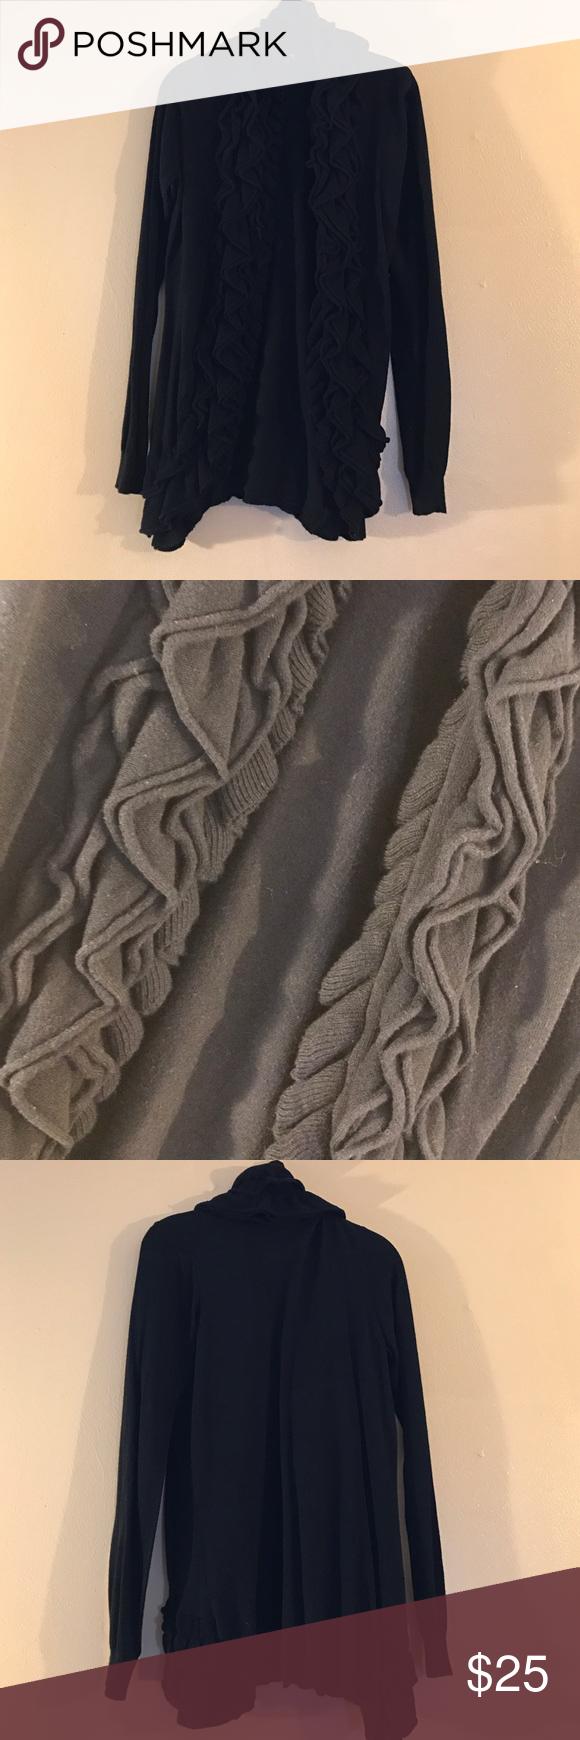 Bebe Shrug Open Front Ruffle Cardigan Ruffle Cardigan, long style, black 55% cotton/ 45% rayon. NO TRADES bebe Sweaters Shrugs & Ponchos